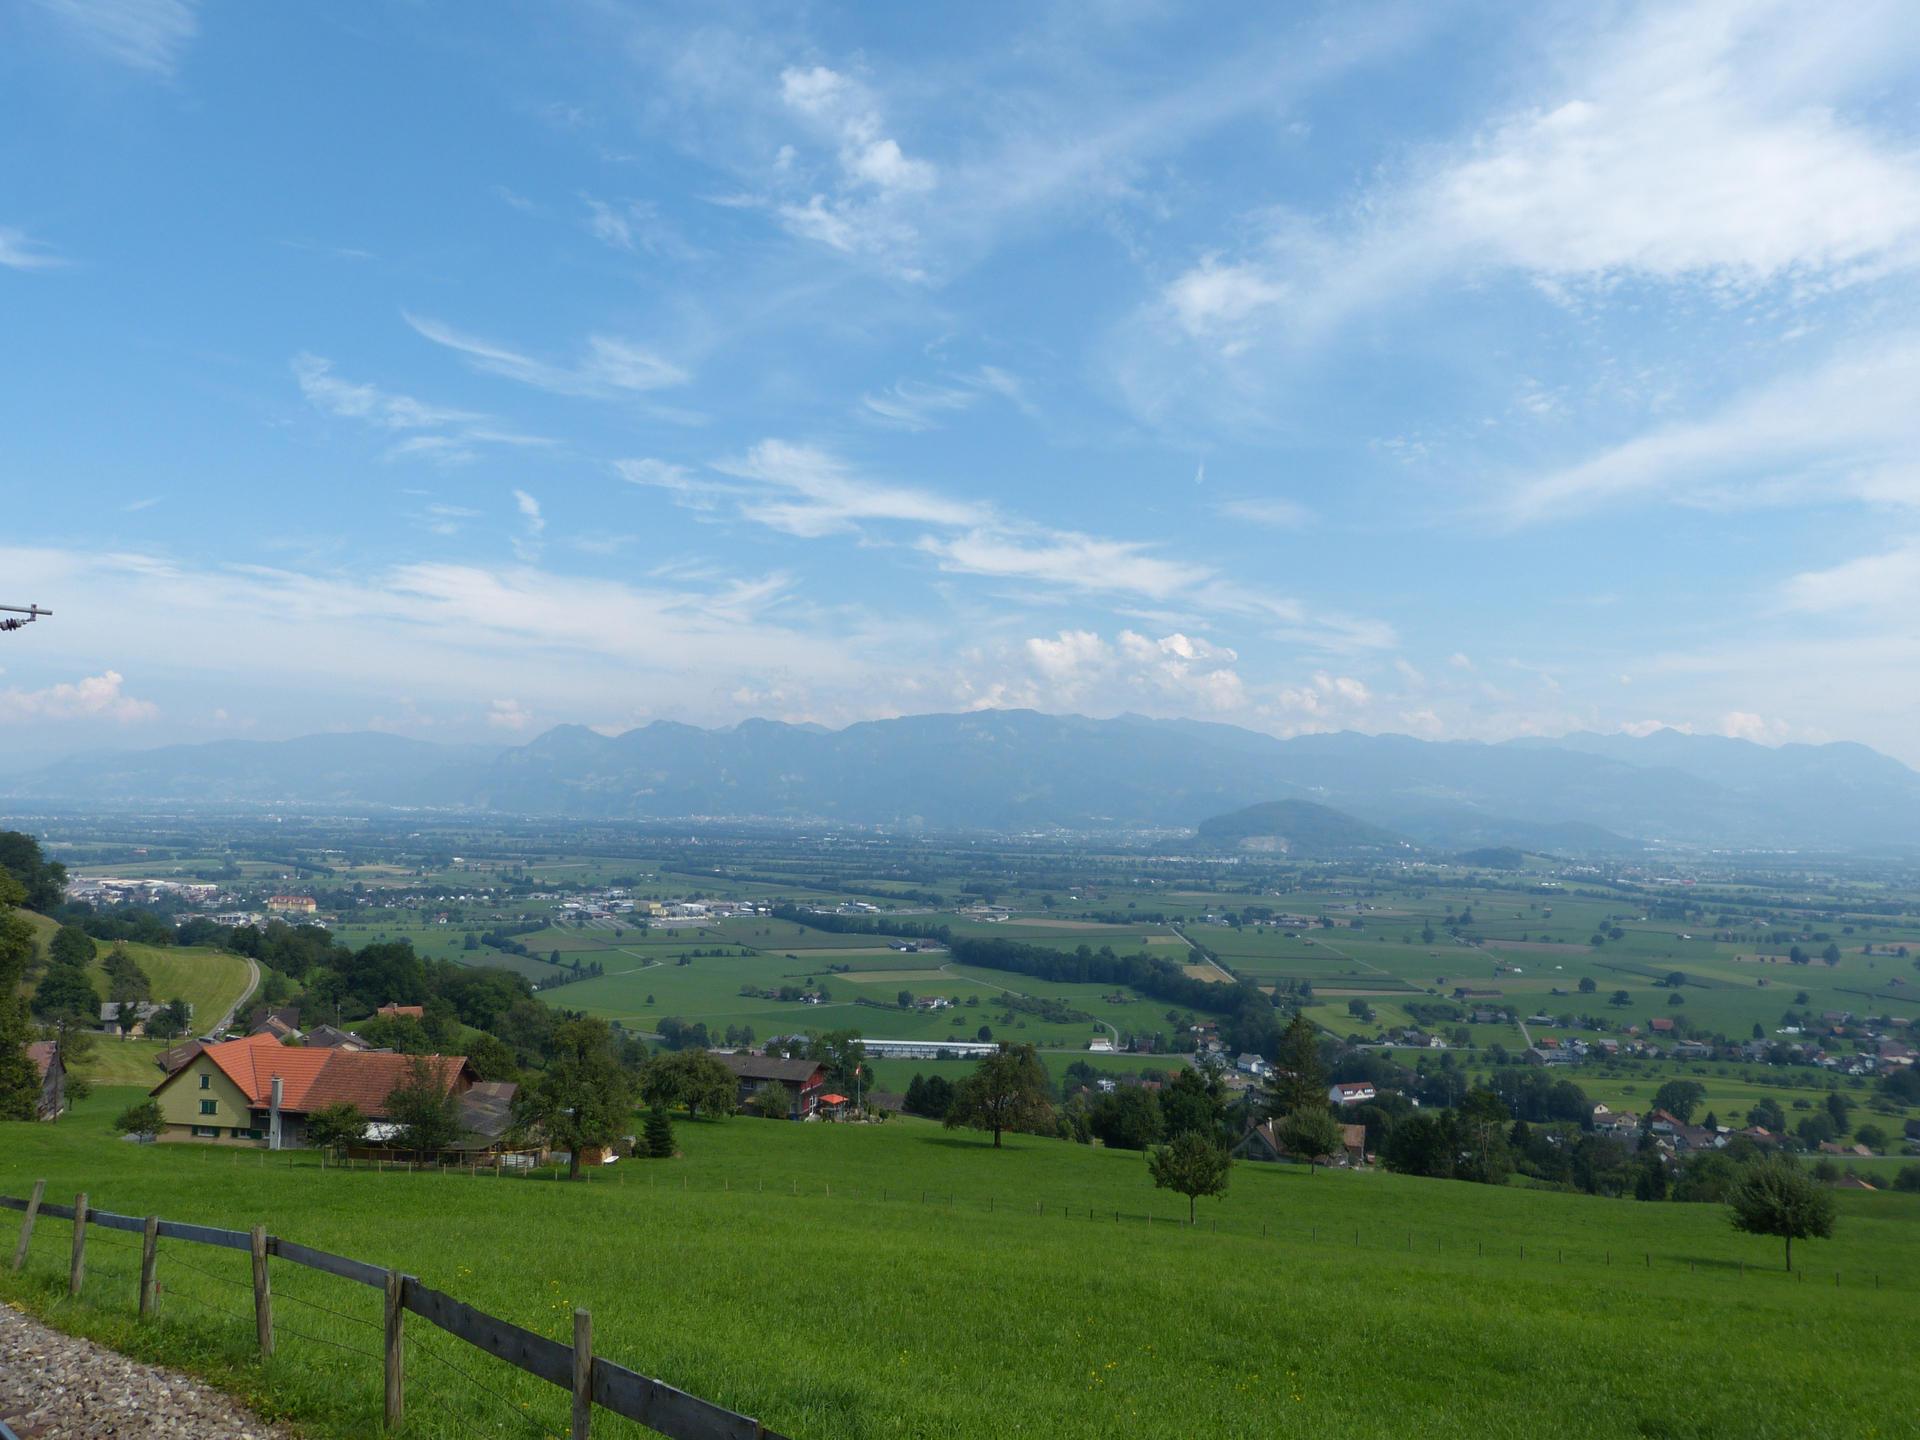 St. Galler Rheintal